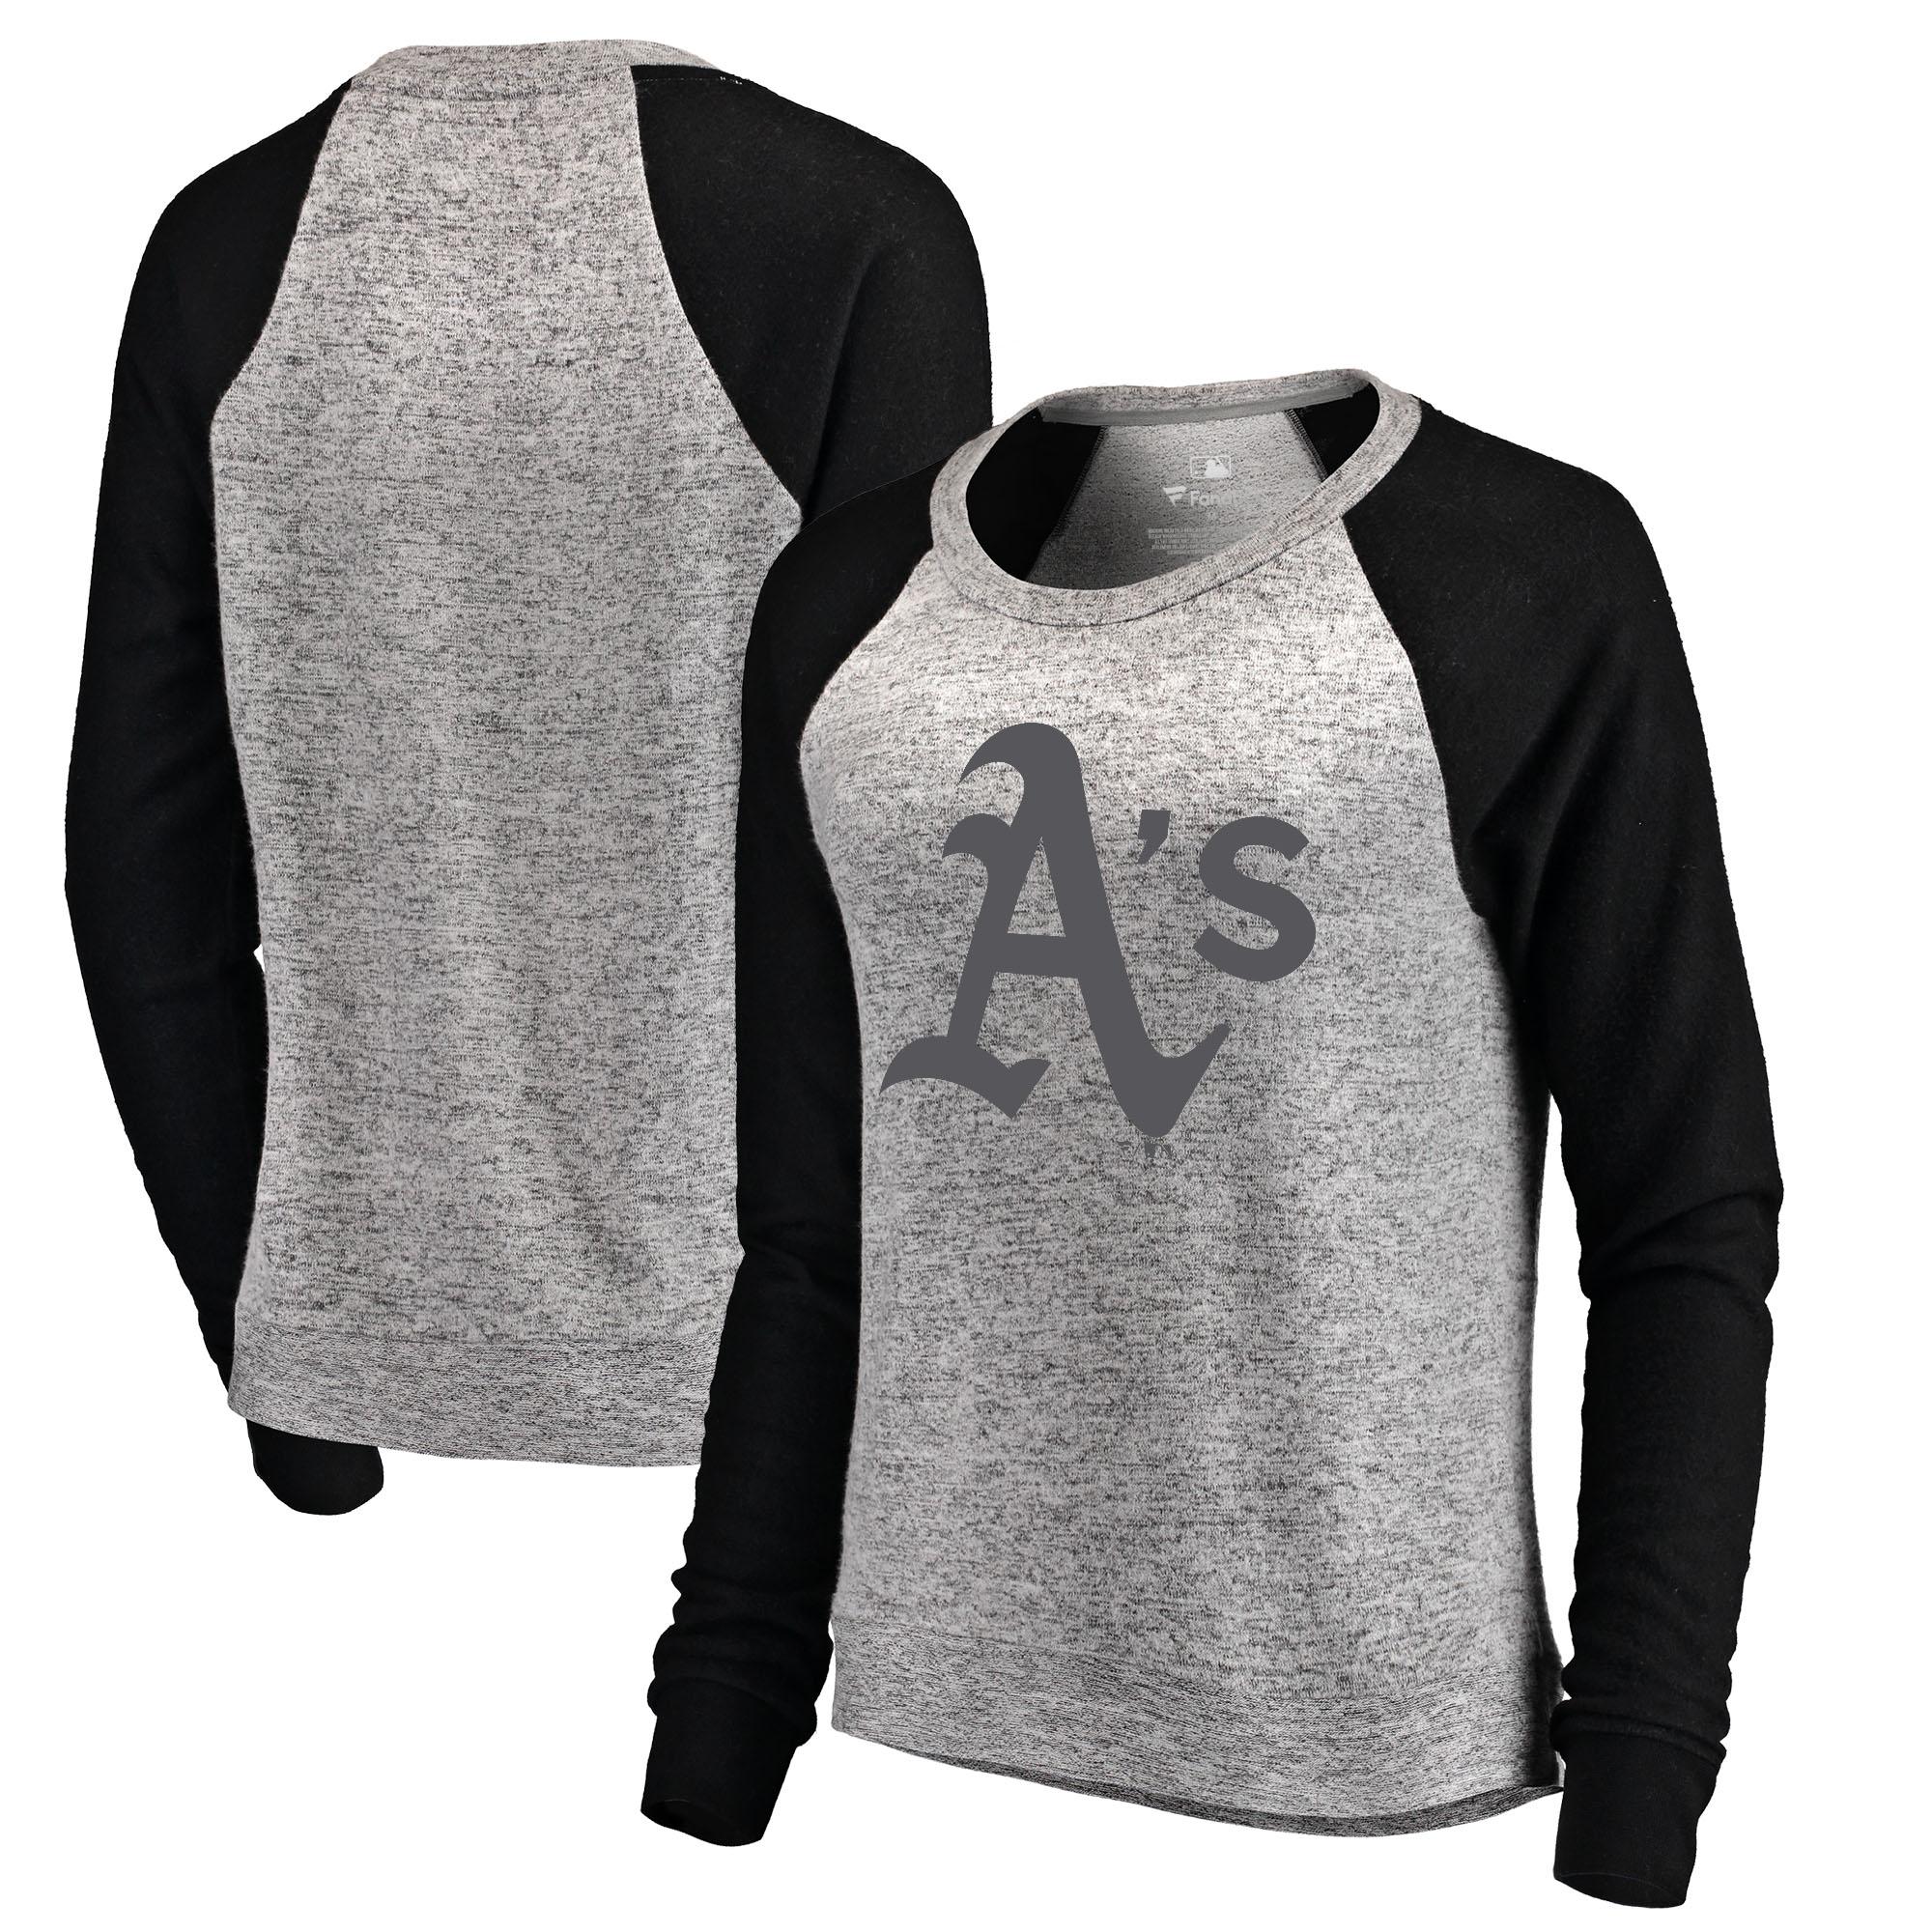 Oakland Athletics Let Loose by RNL Women's Cozy Collection Plush Raglan Tri-Blend Sweatshirt - Ash